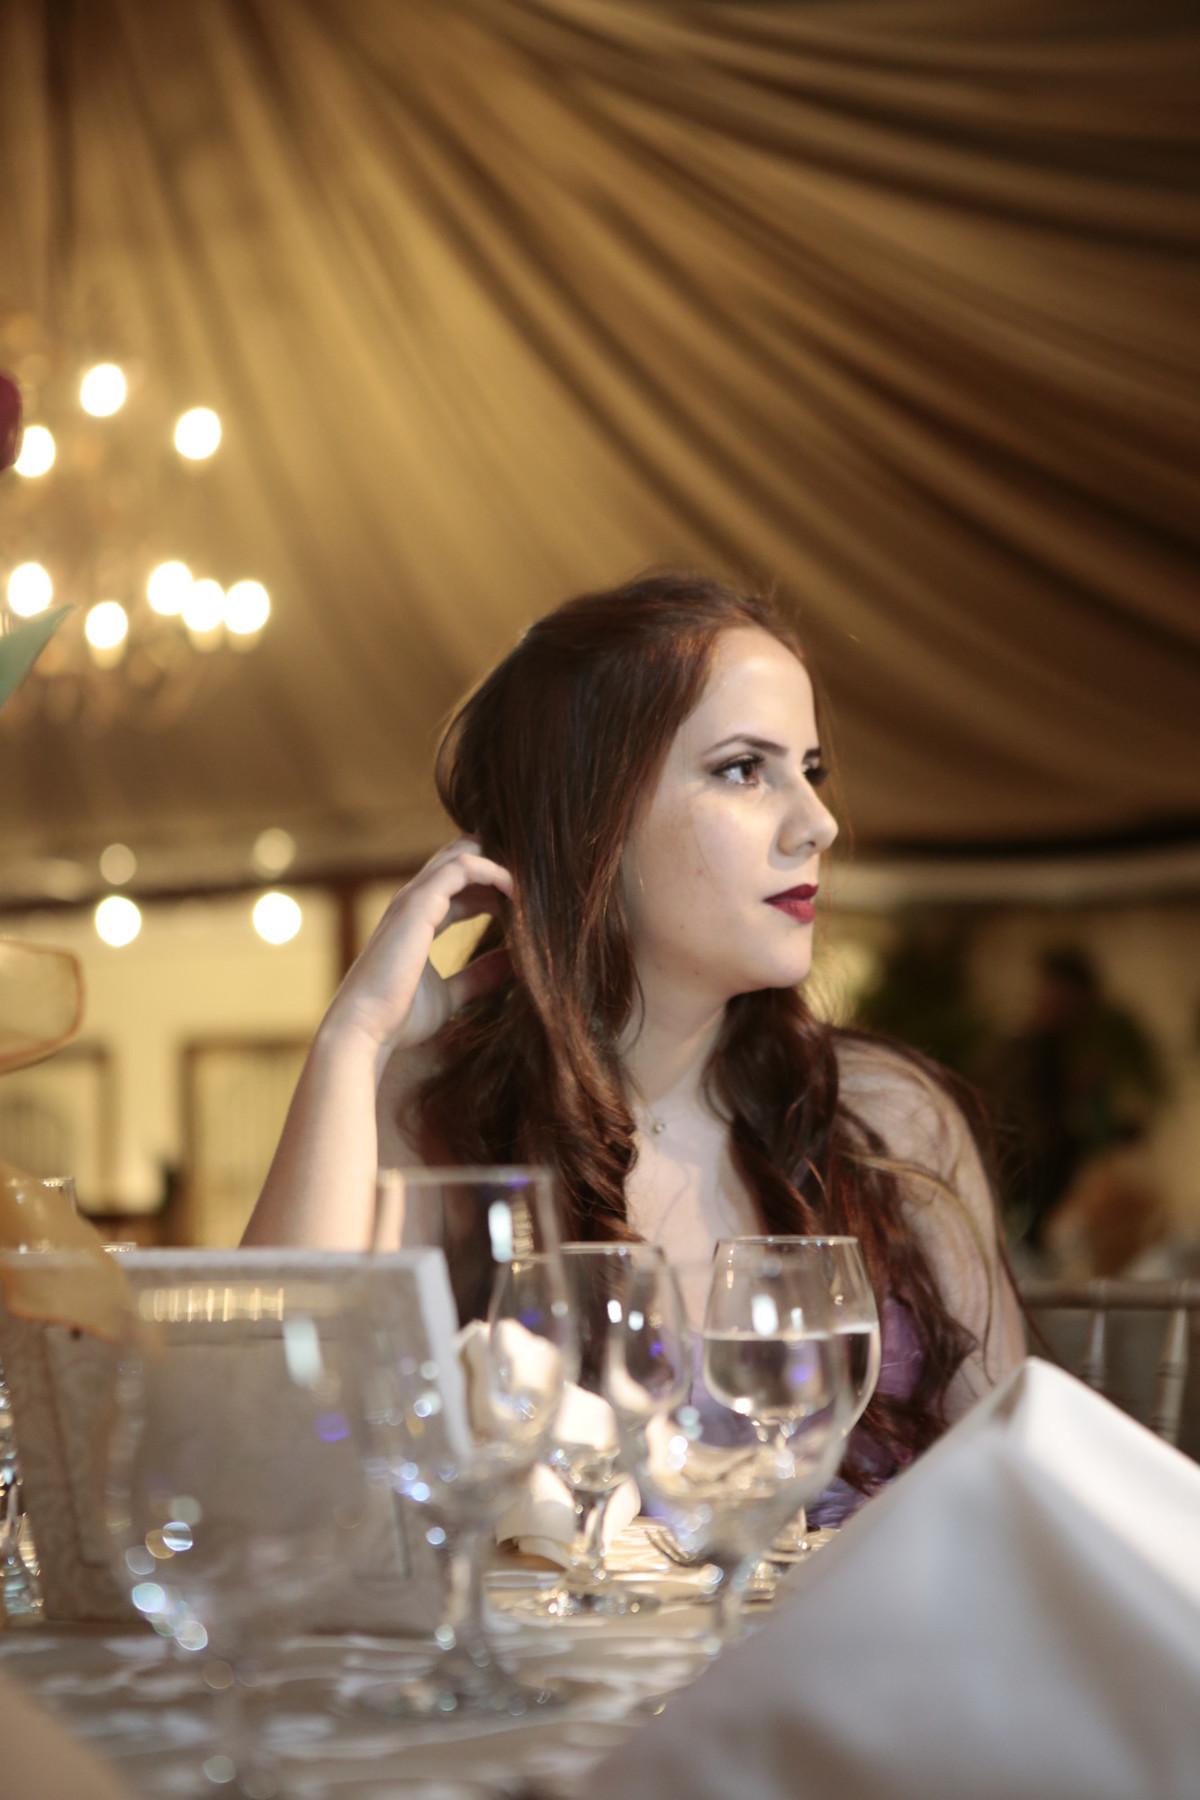 fotografias Aniversário debutante da Fernanda D'avila no buffet grande ville